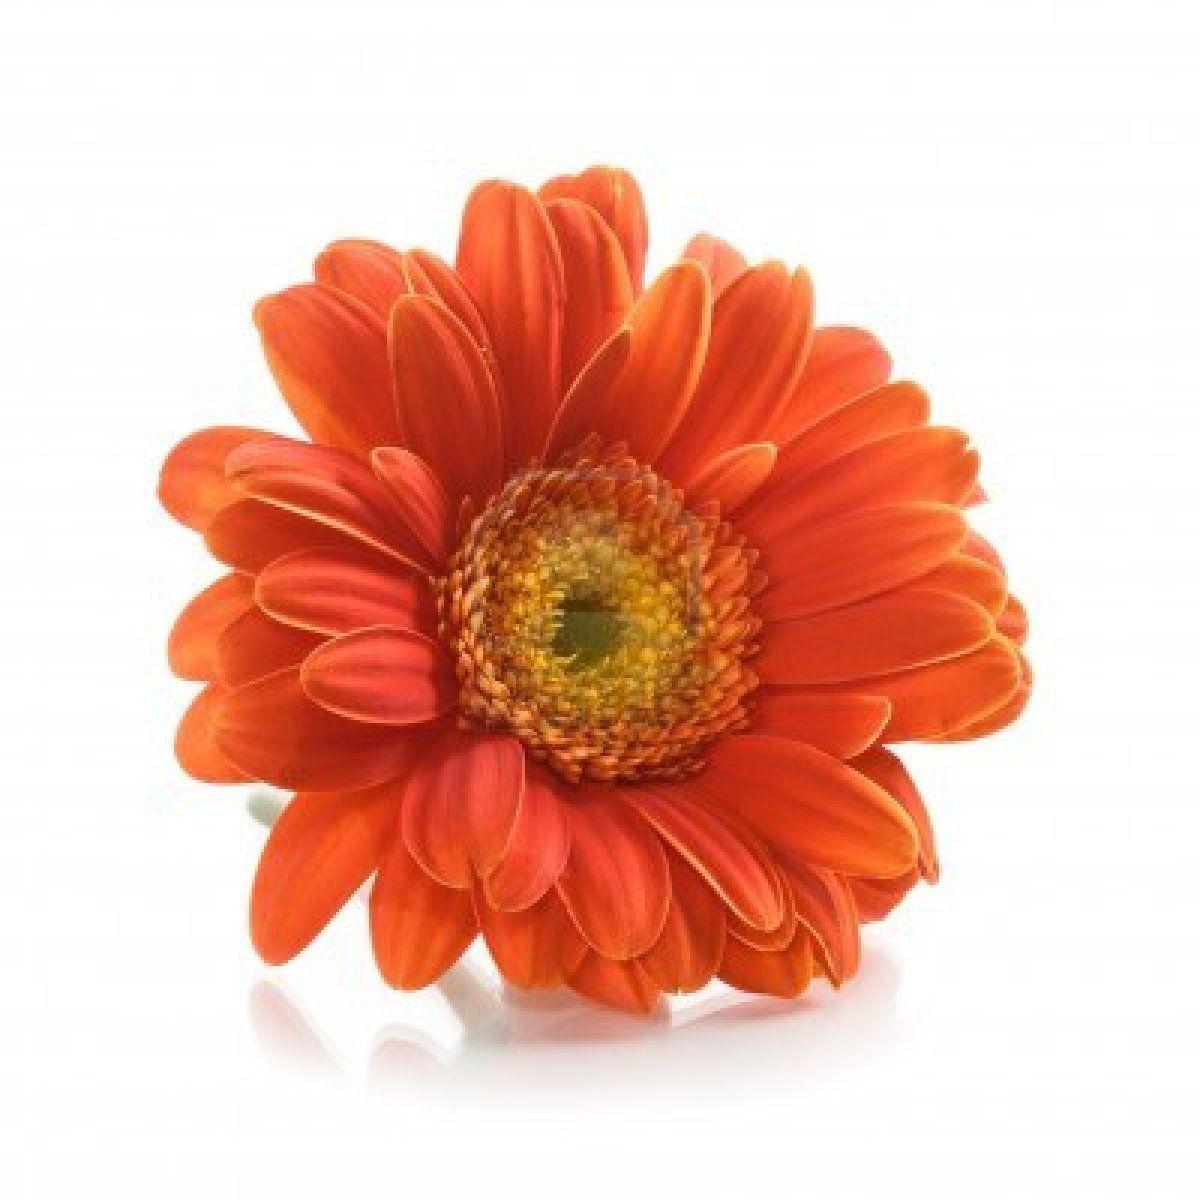 Single Orange Gerbera Daisy Flower On White Background Gerbera Daisy Daisy Flower Flowers